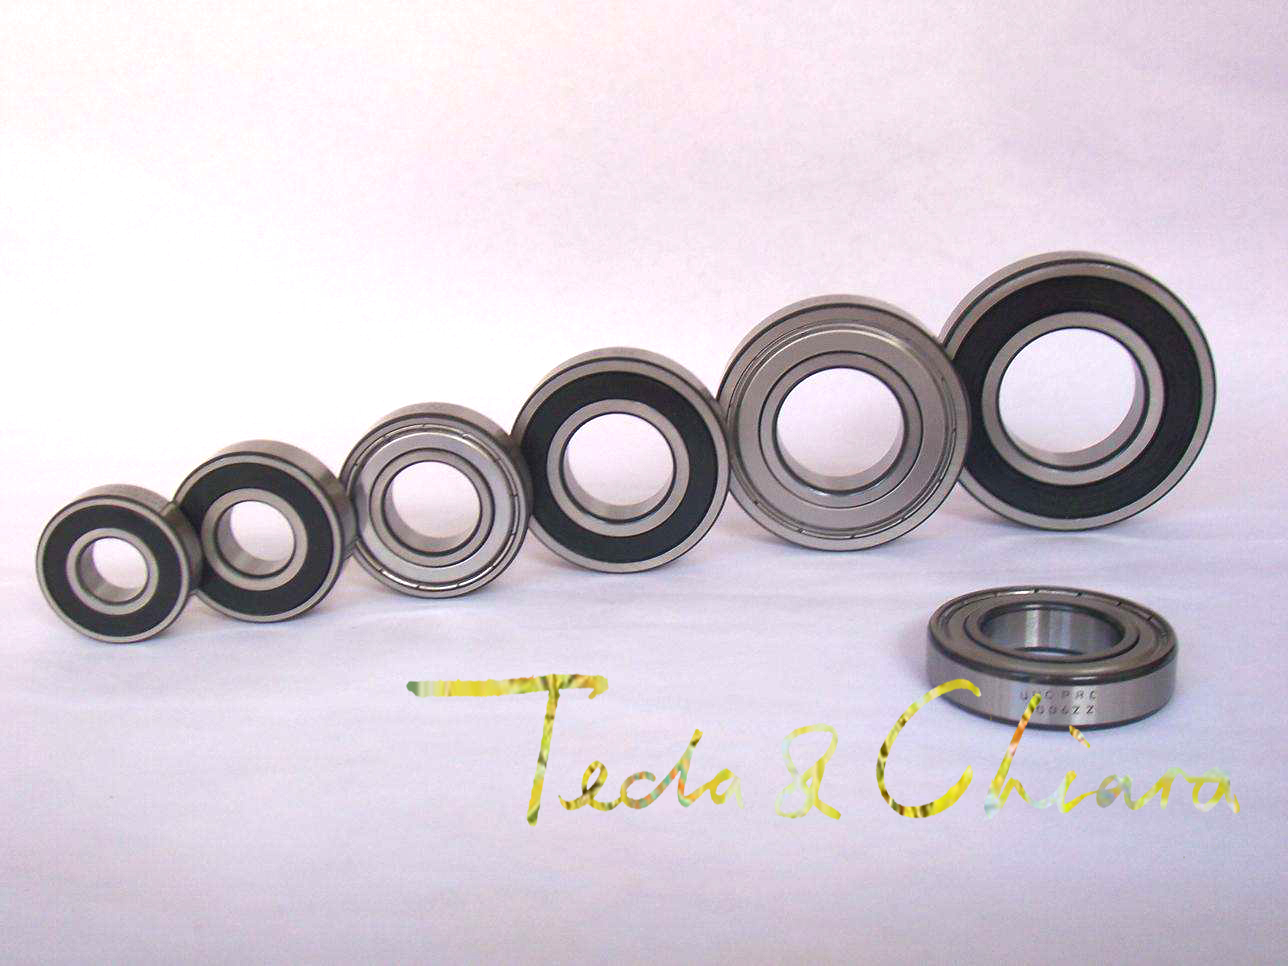 689 689ZZ 689RS 689-2Z 689Z 689-2RS ZZ RS RZ 2RZ Deep Groove Ball Bearings 9 x 17 x 5mm High Quality mr74 674zz 674rs mr74zz mr74rs mr74 2z mr74z mr74 2rs 674 674z zz rs rz 2rz deep groove ball bearings 4 x 7 x 2 5mm high quality